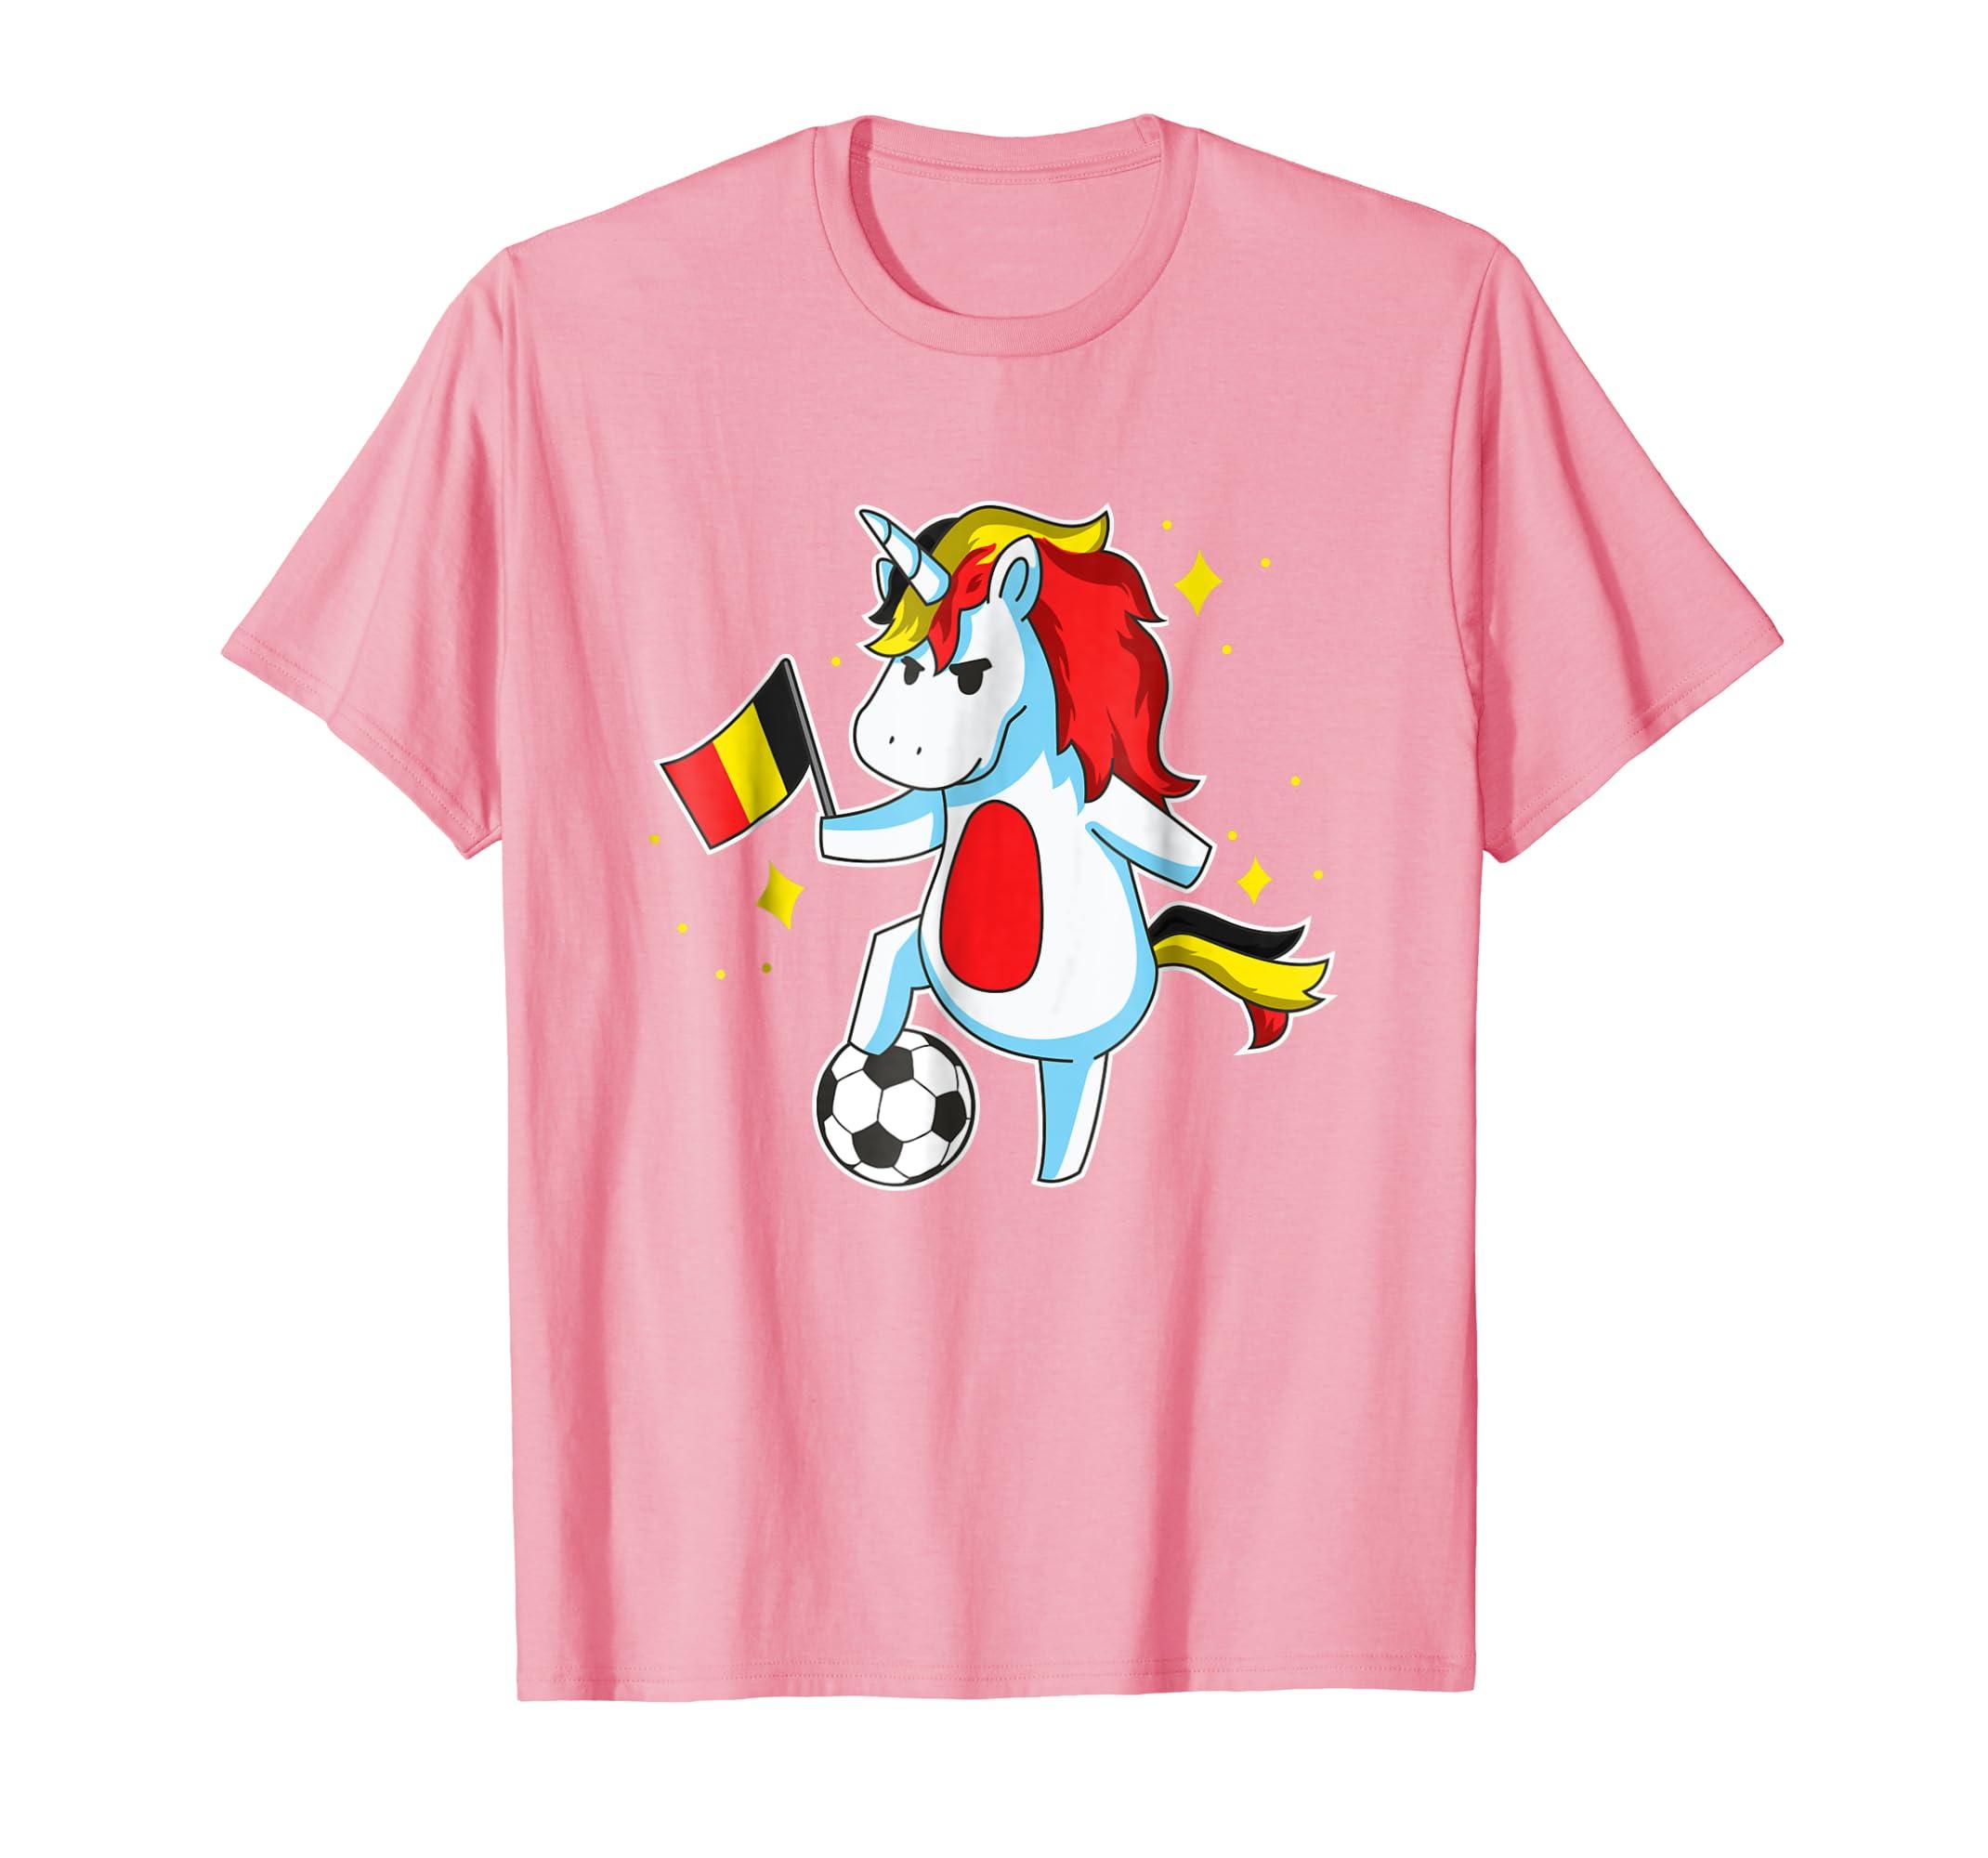 513224c1a Amazon.com  Soccer Unicorn Belgium Jersey Shirt Belgian Football Gift   Clothing